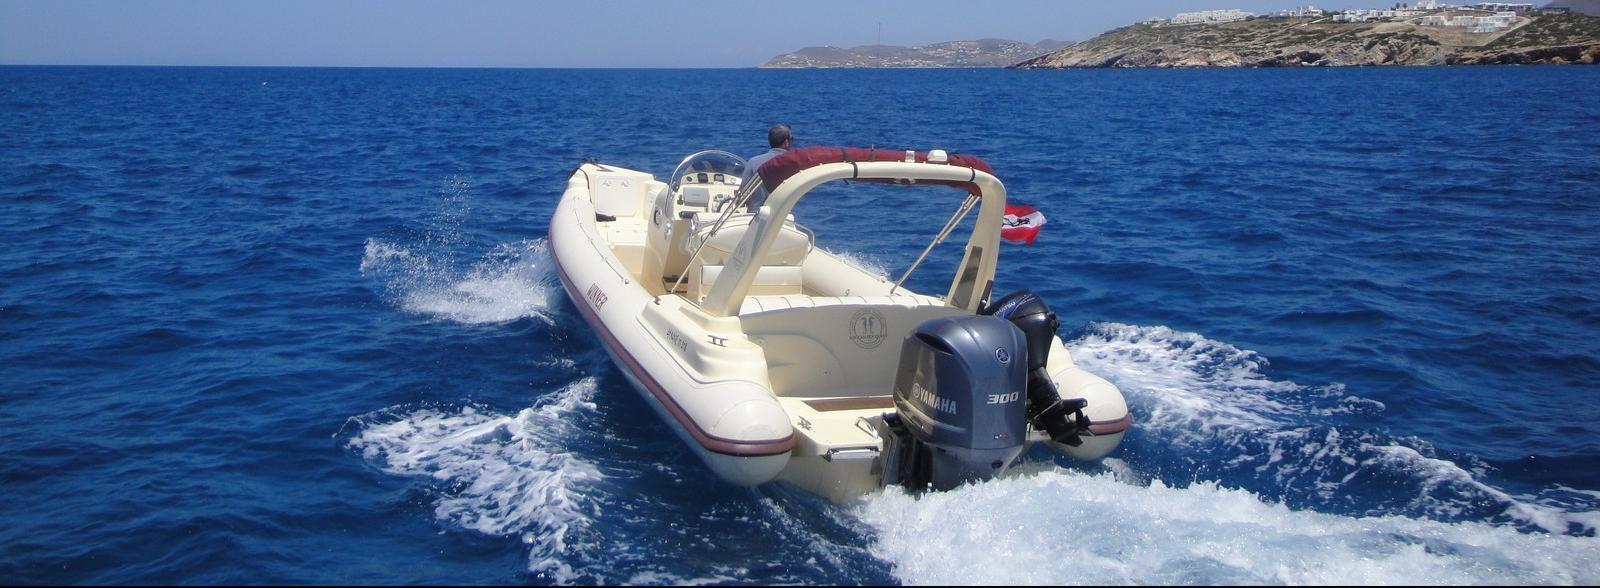 Sea transfer